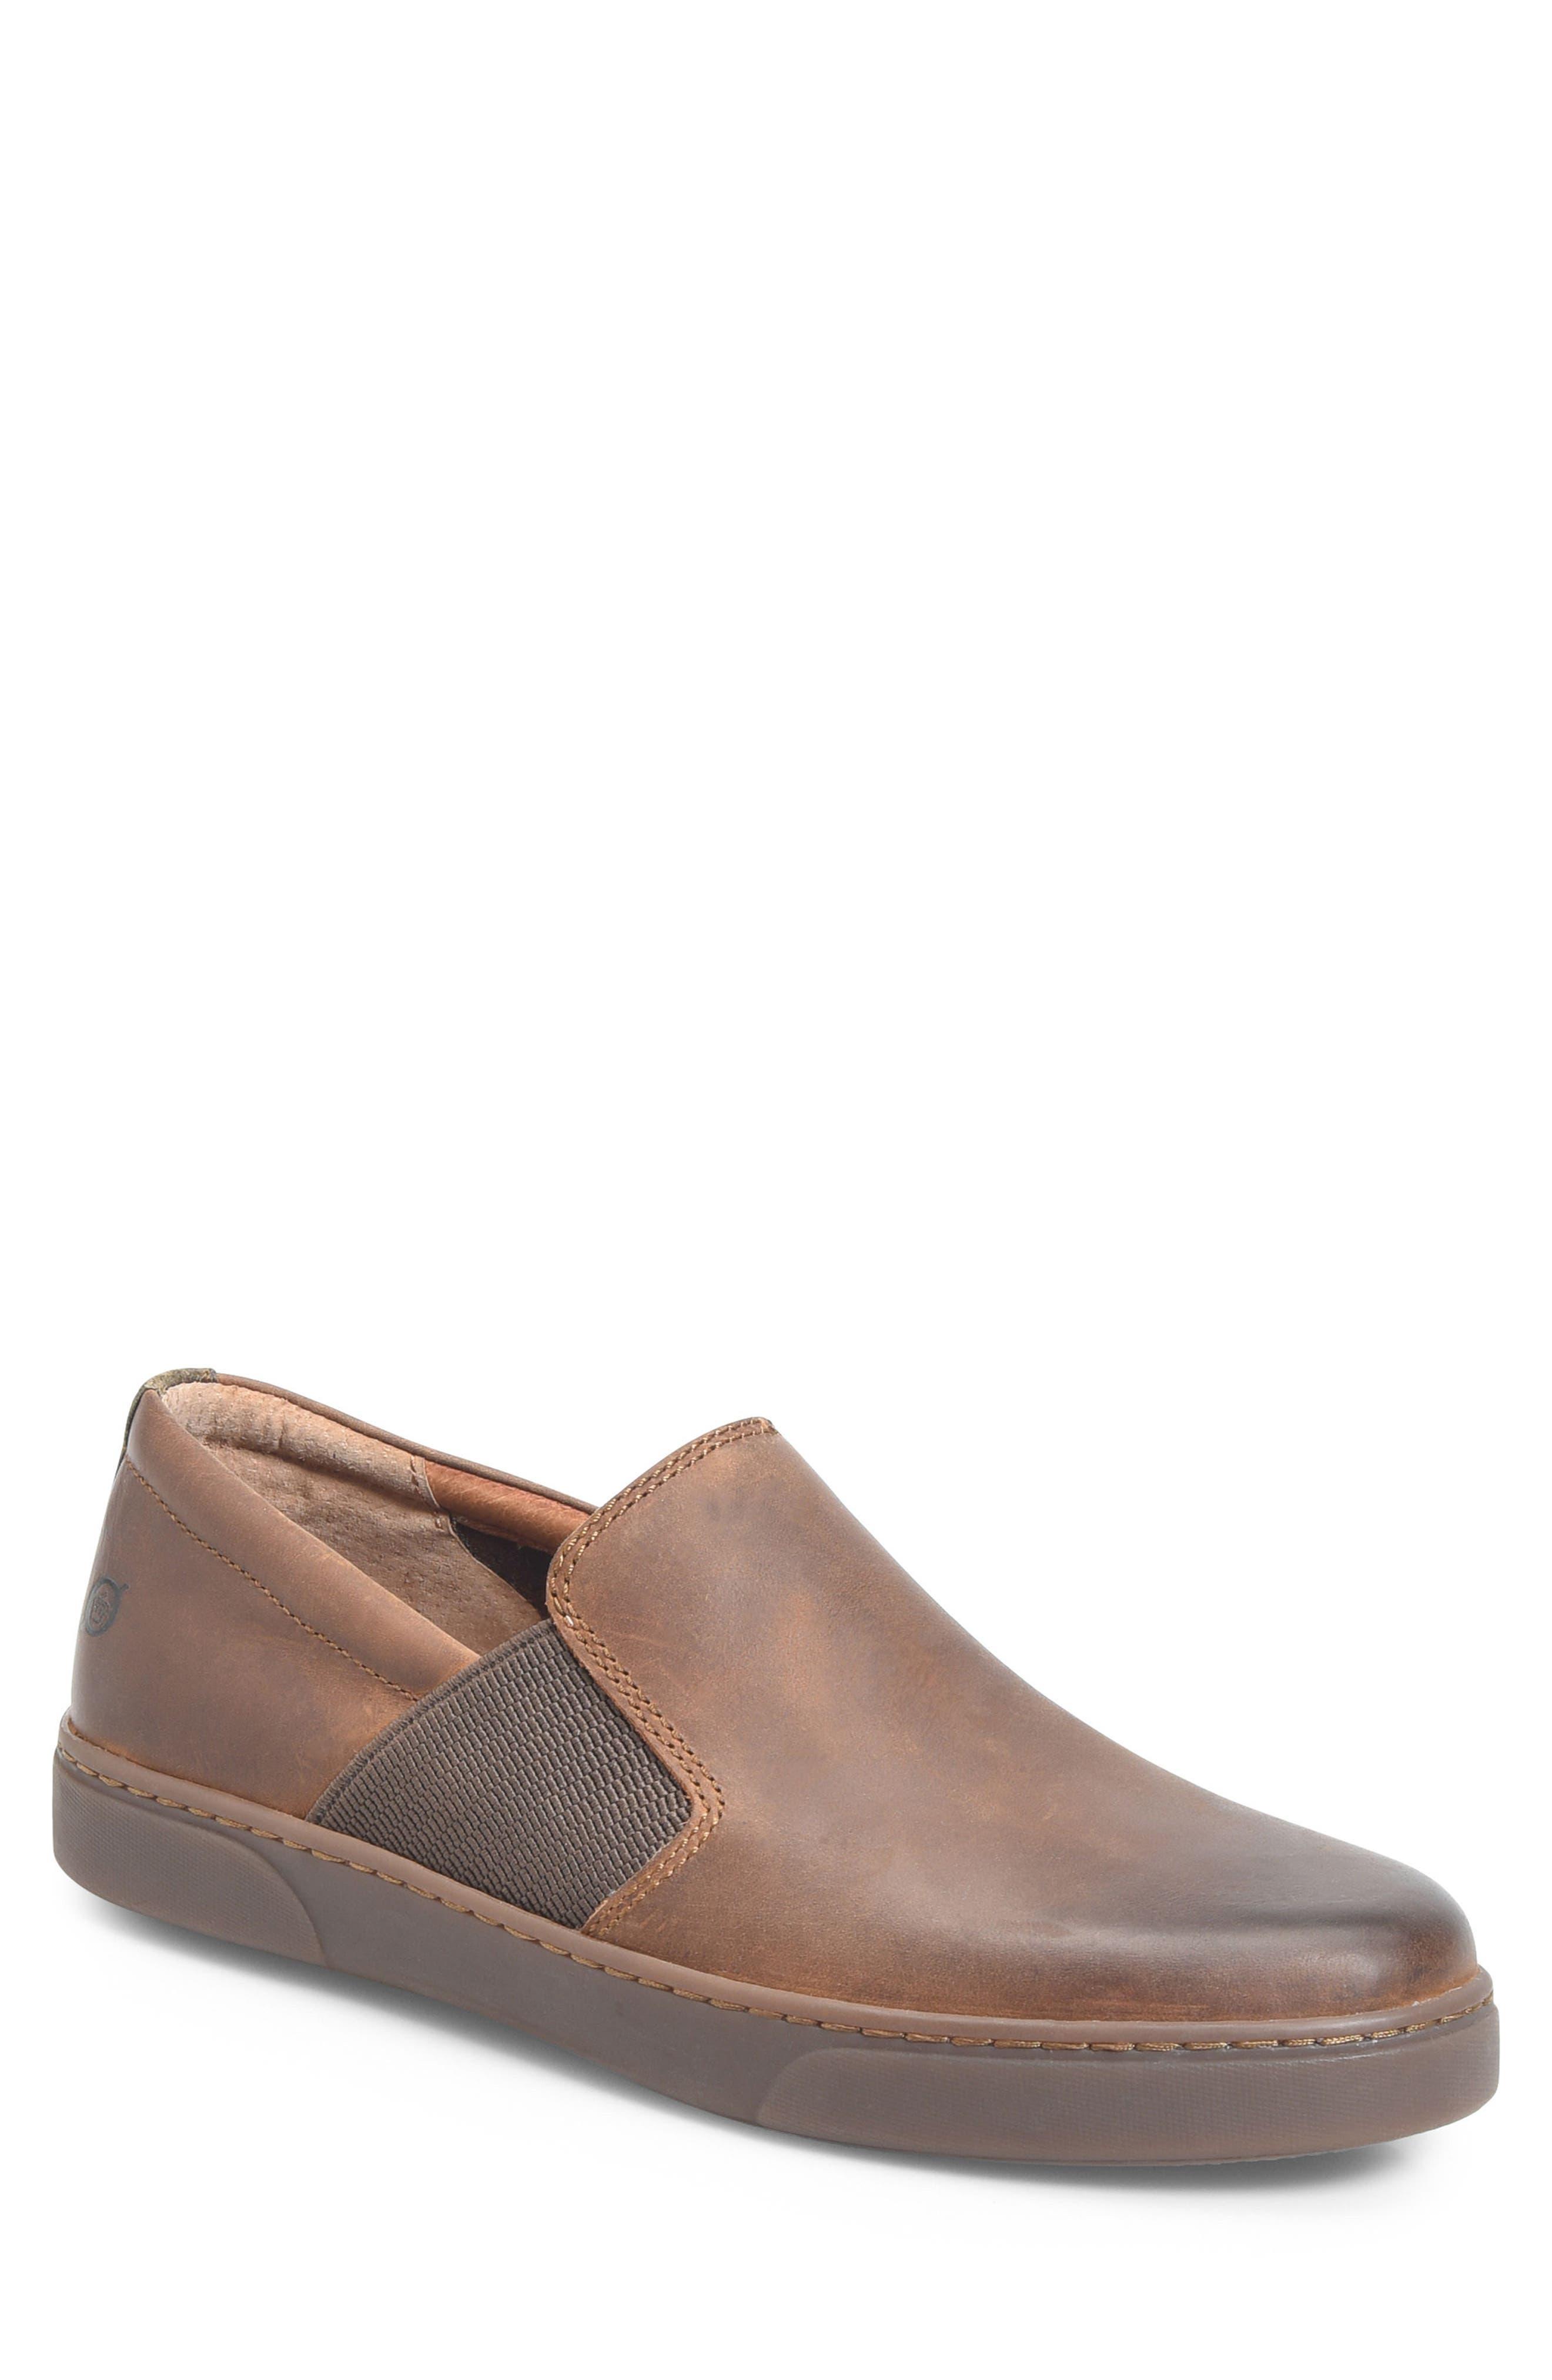 Alternate Image 1 Selected - Børn Belford Slip-On Sneaker (Men)